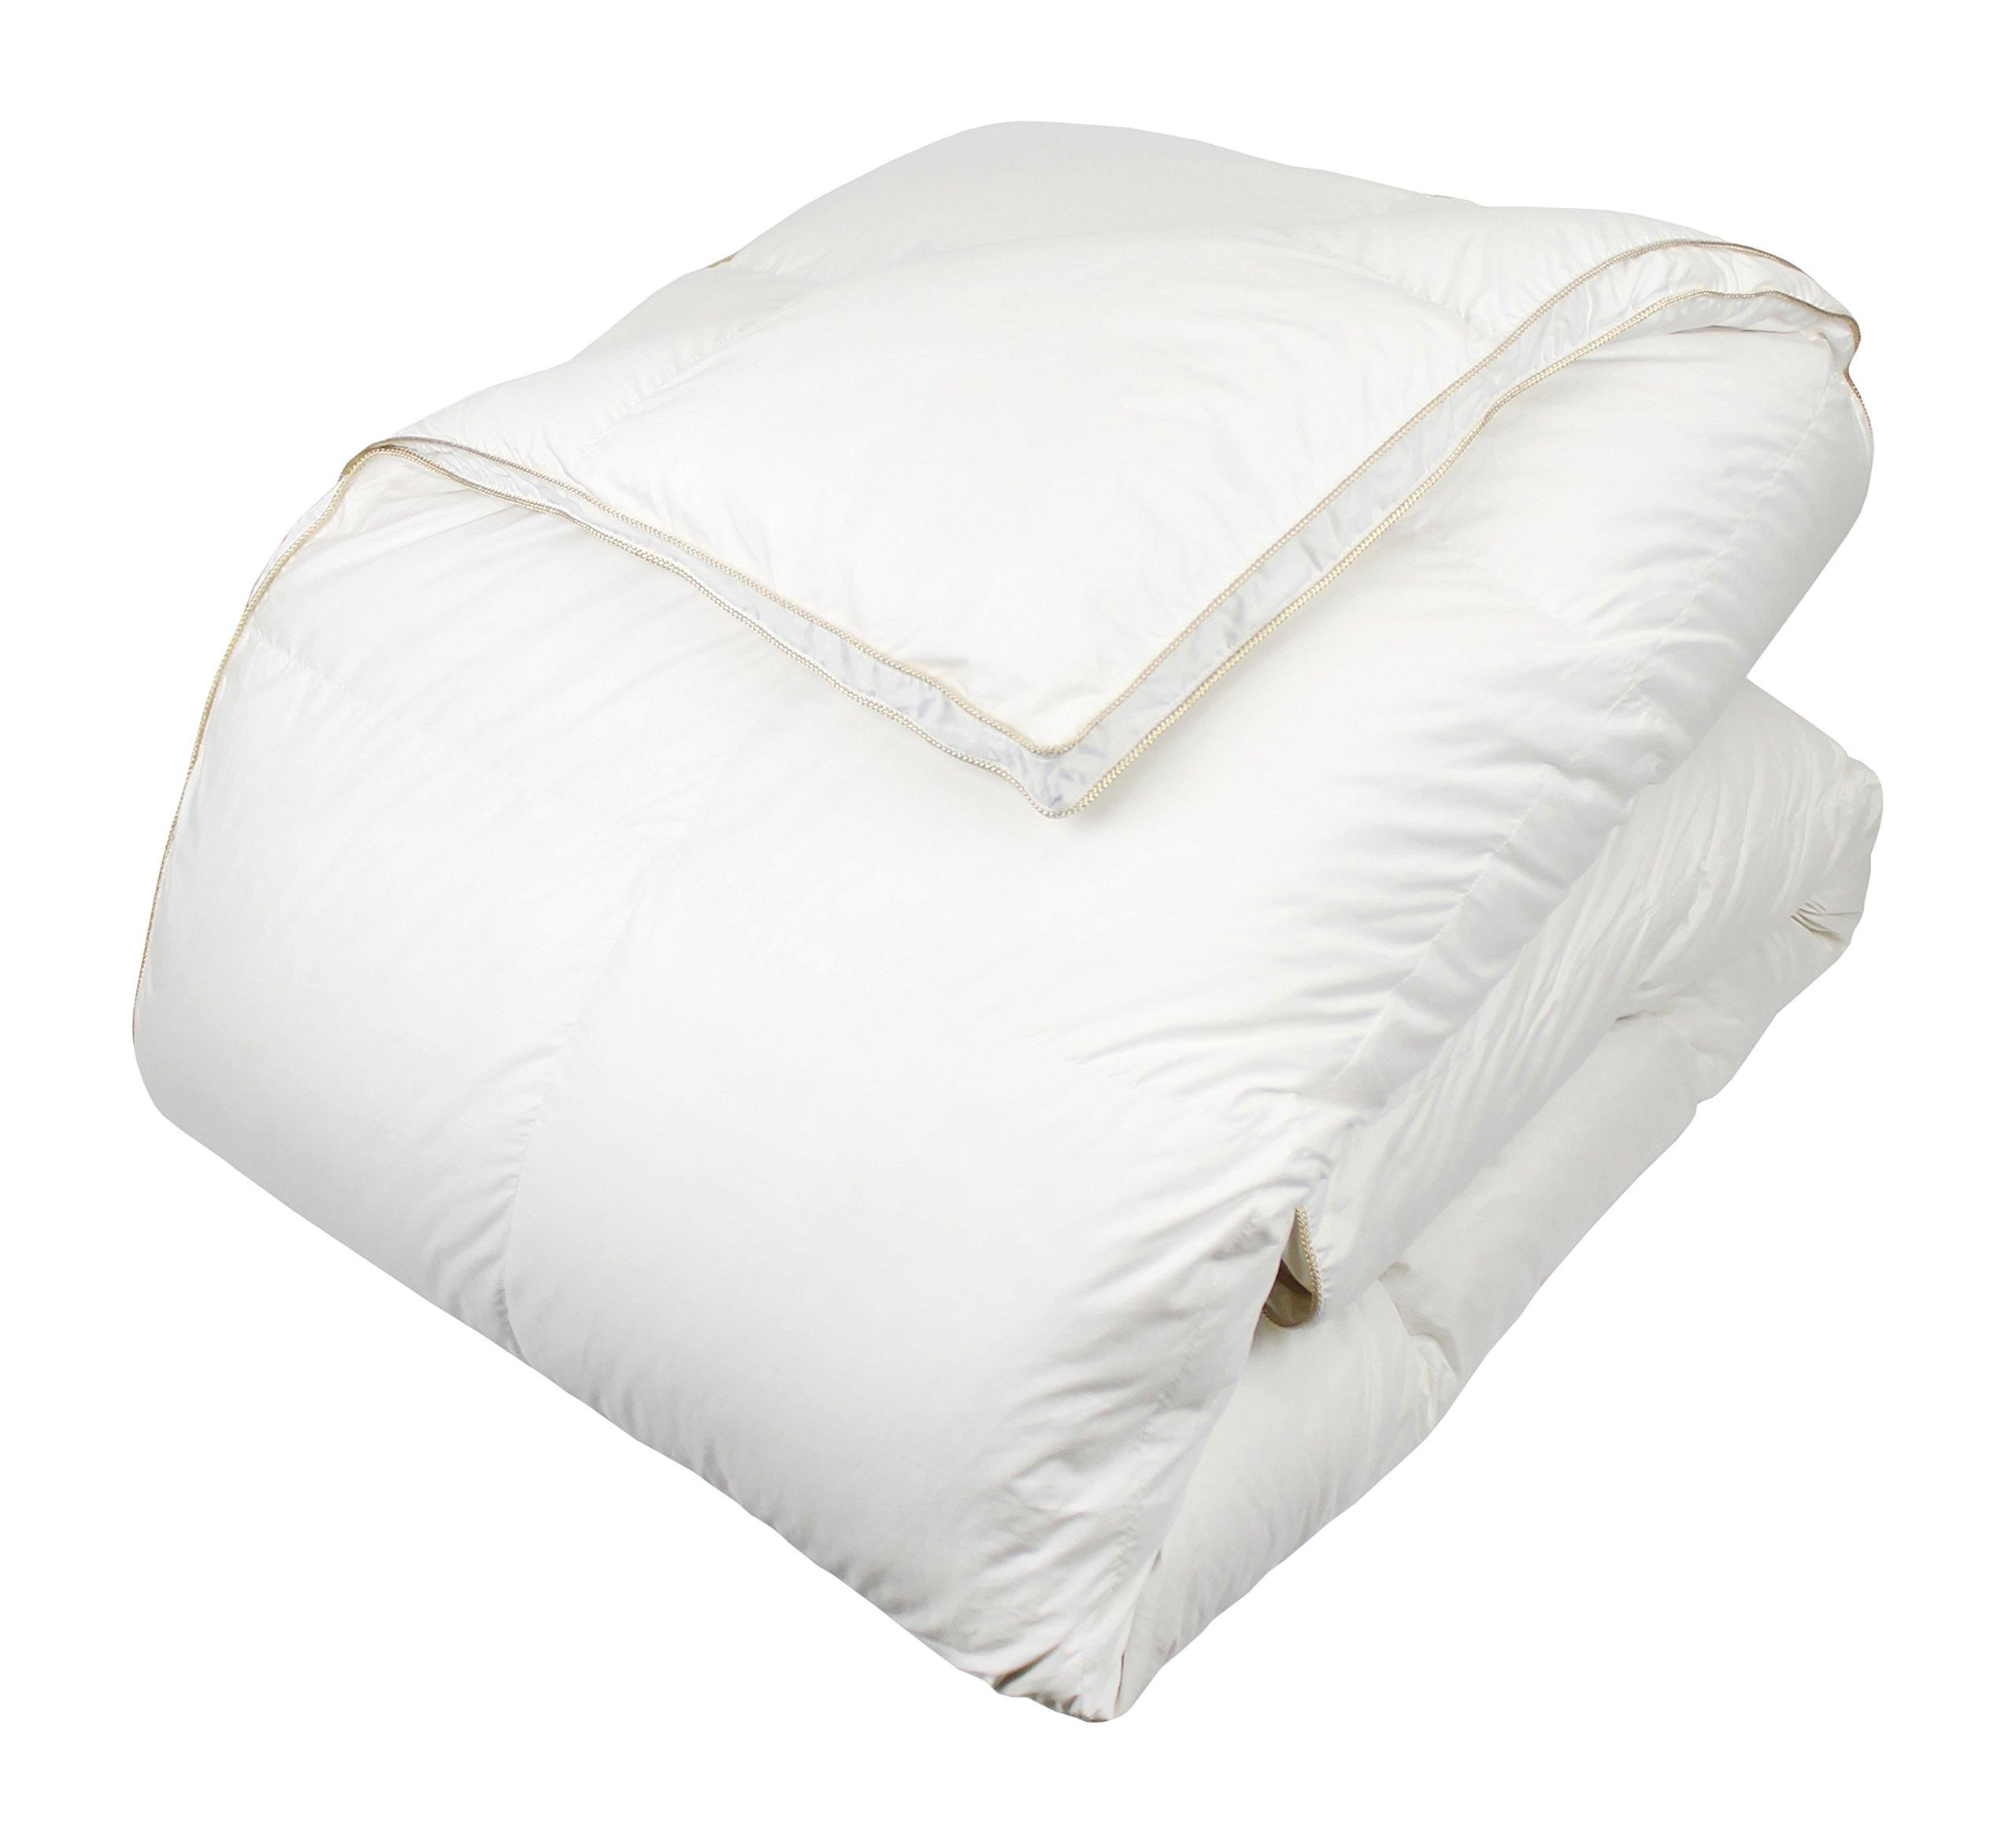 Century Home C352-174 Glucksberg European White Goose Down Comforter, King